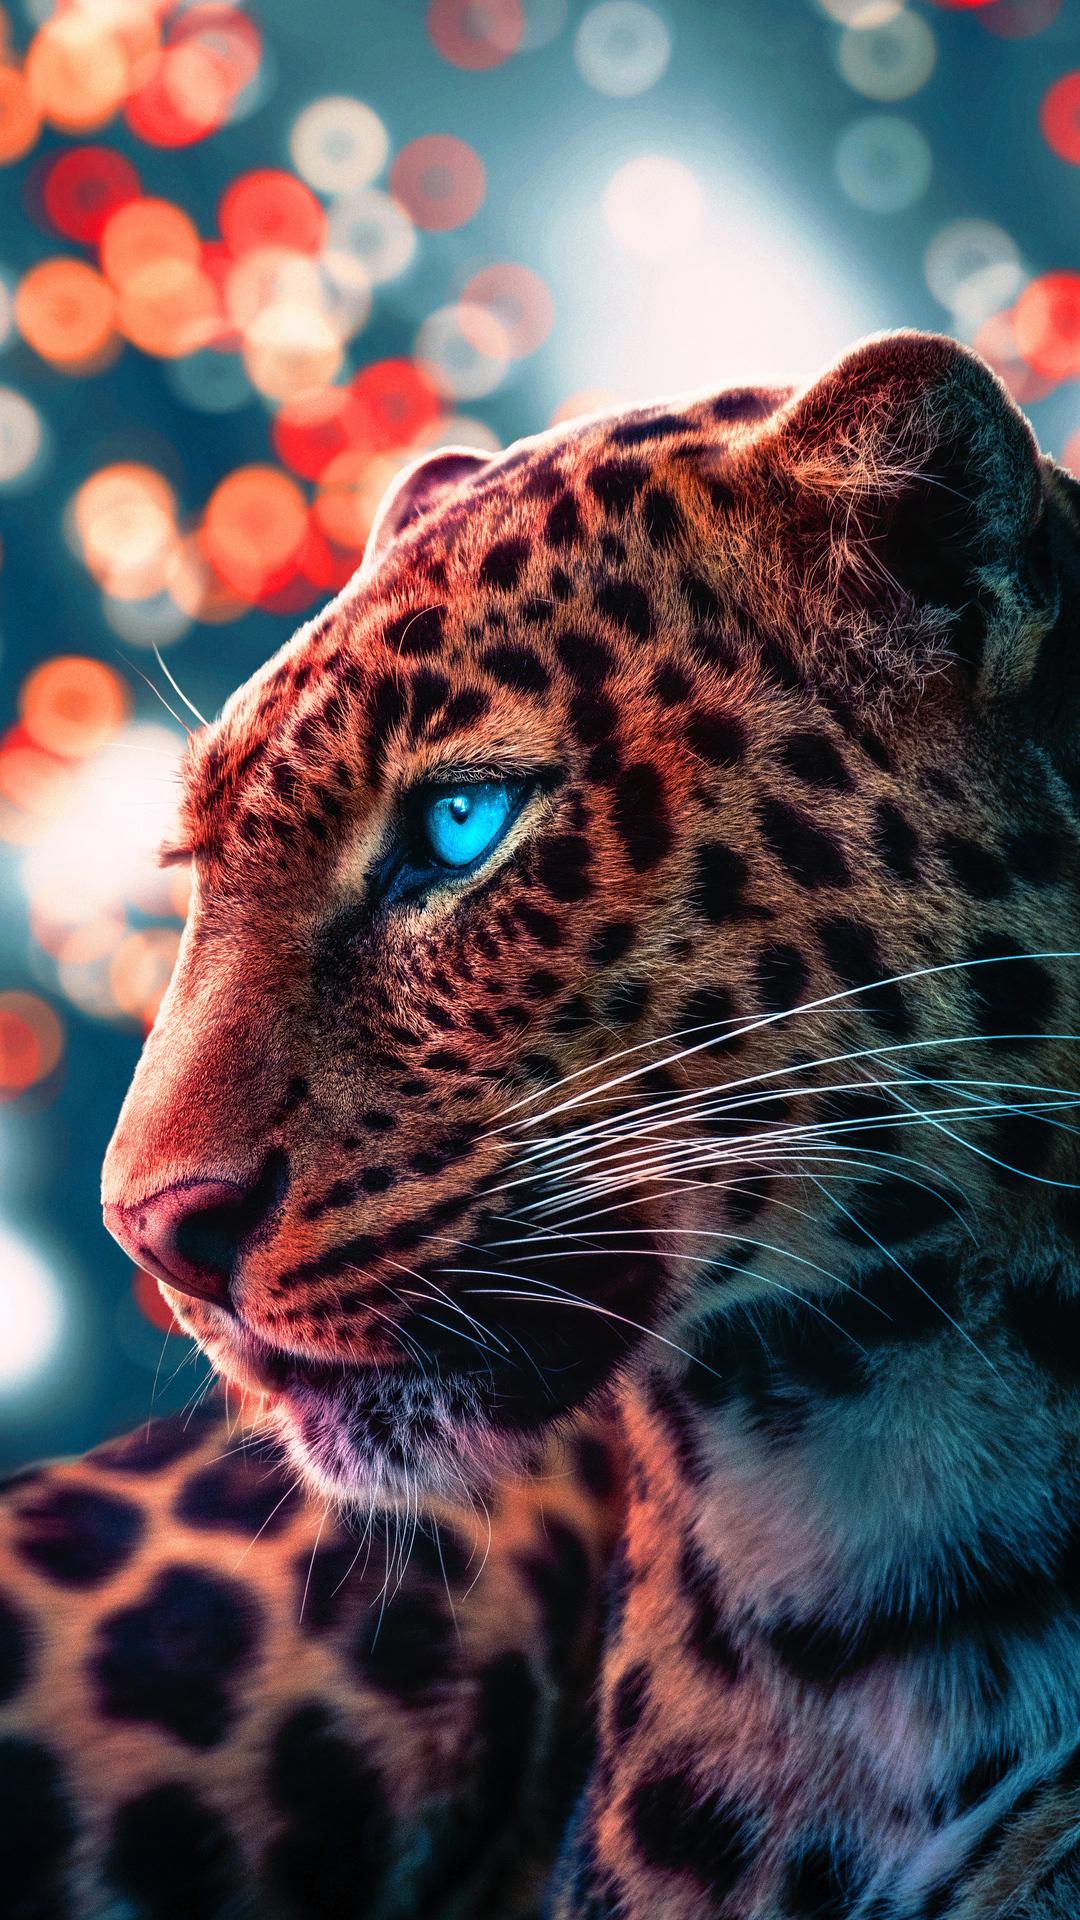 cheetah-magical-eyes-4k-q0.jpg